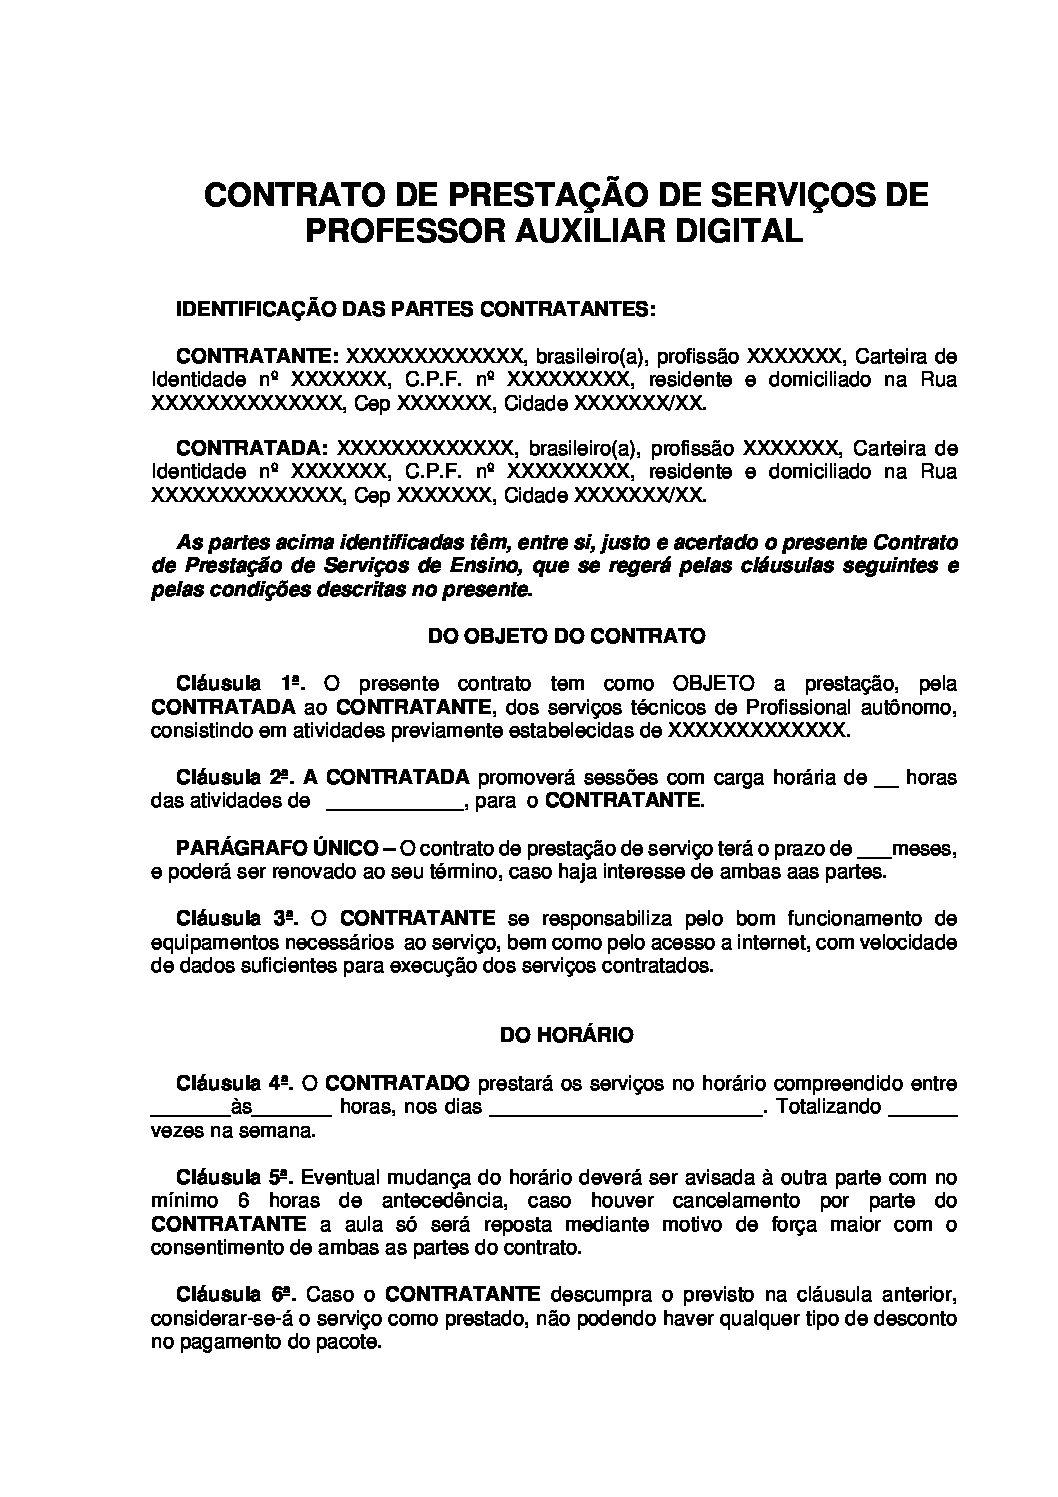 Contrato de Serviços de Professor Auxiliar Digital